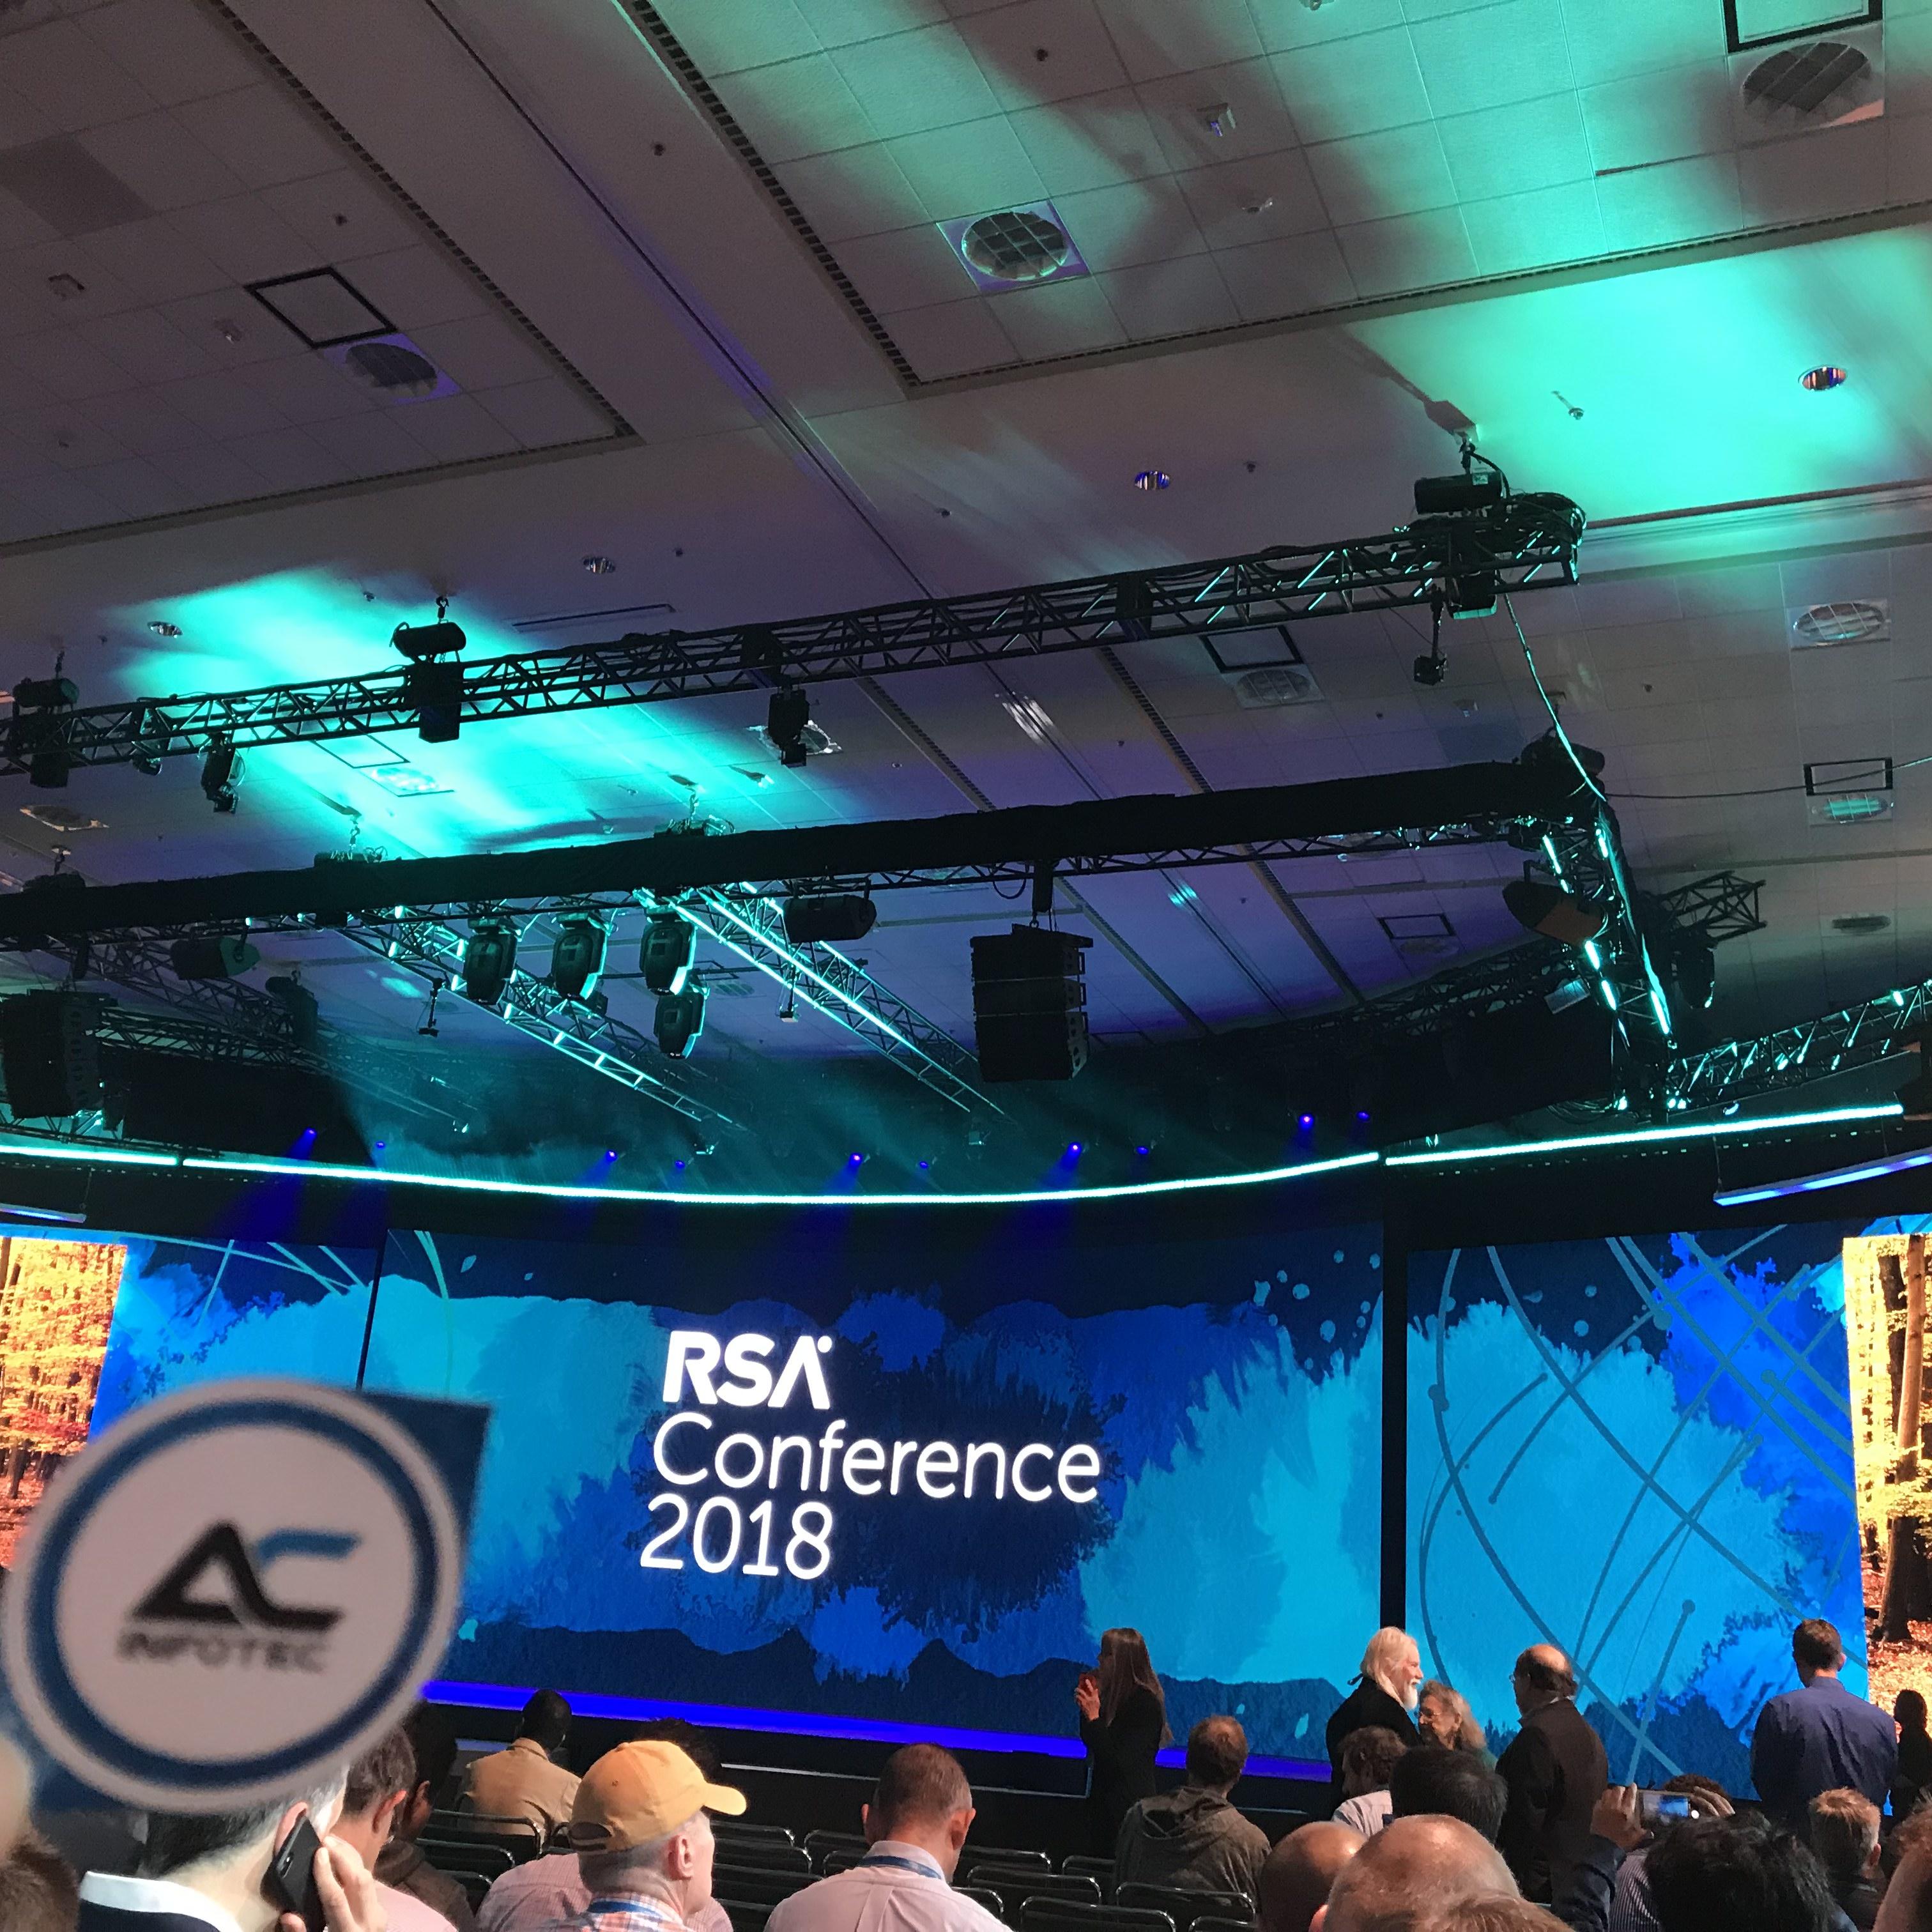 ACinfotec พาเที่ยวงาน RSA Conference 2018 ณ Moscone Center ซานฟรานซิสโก – ep1 แนะนำภาพรวมของงาน